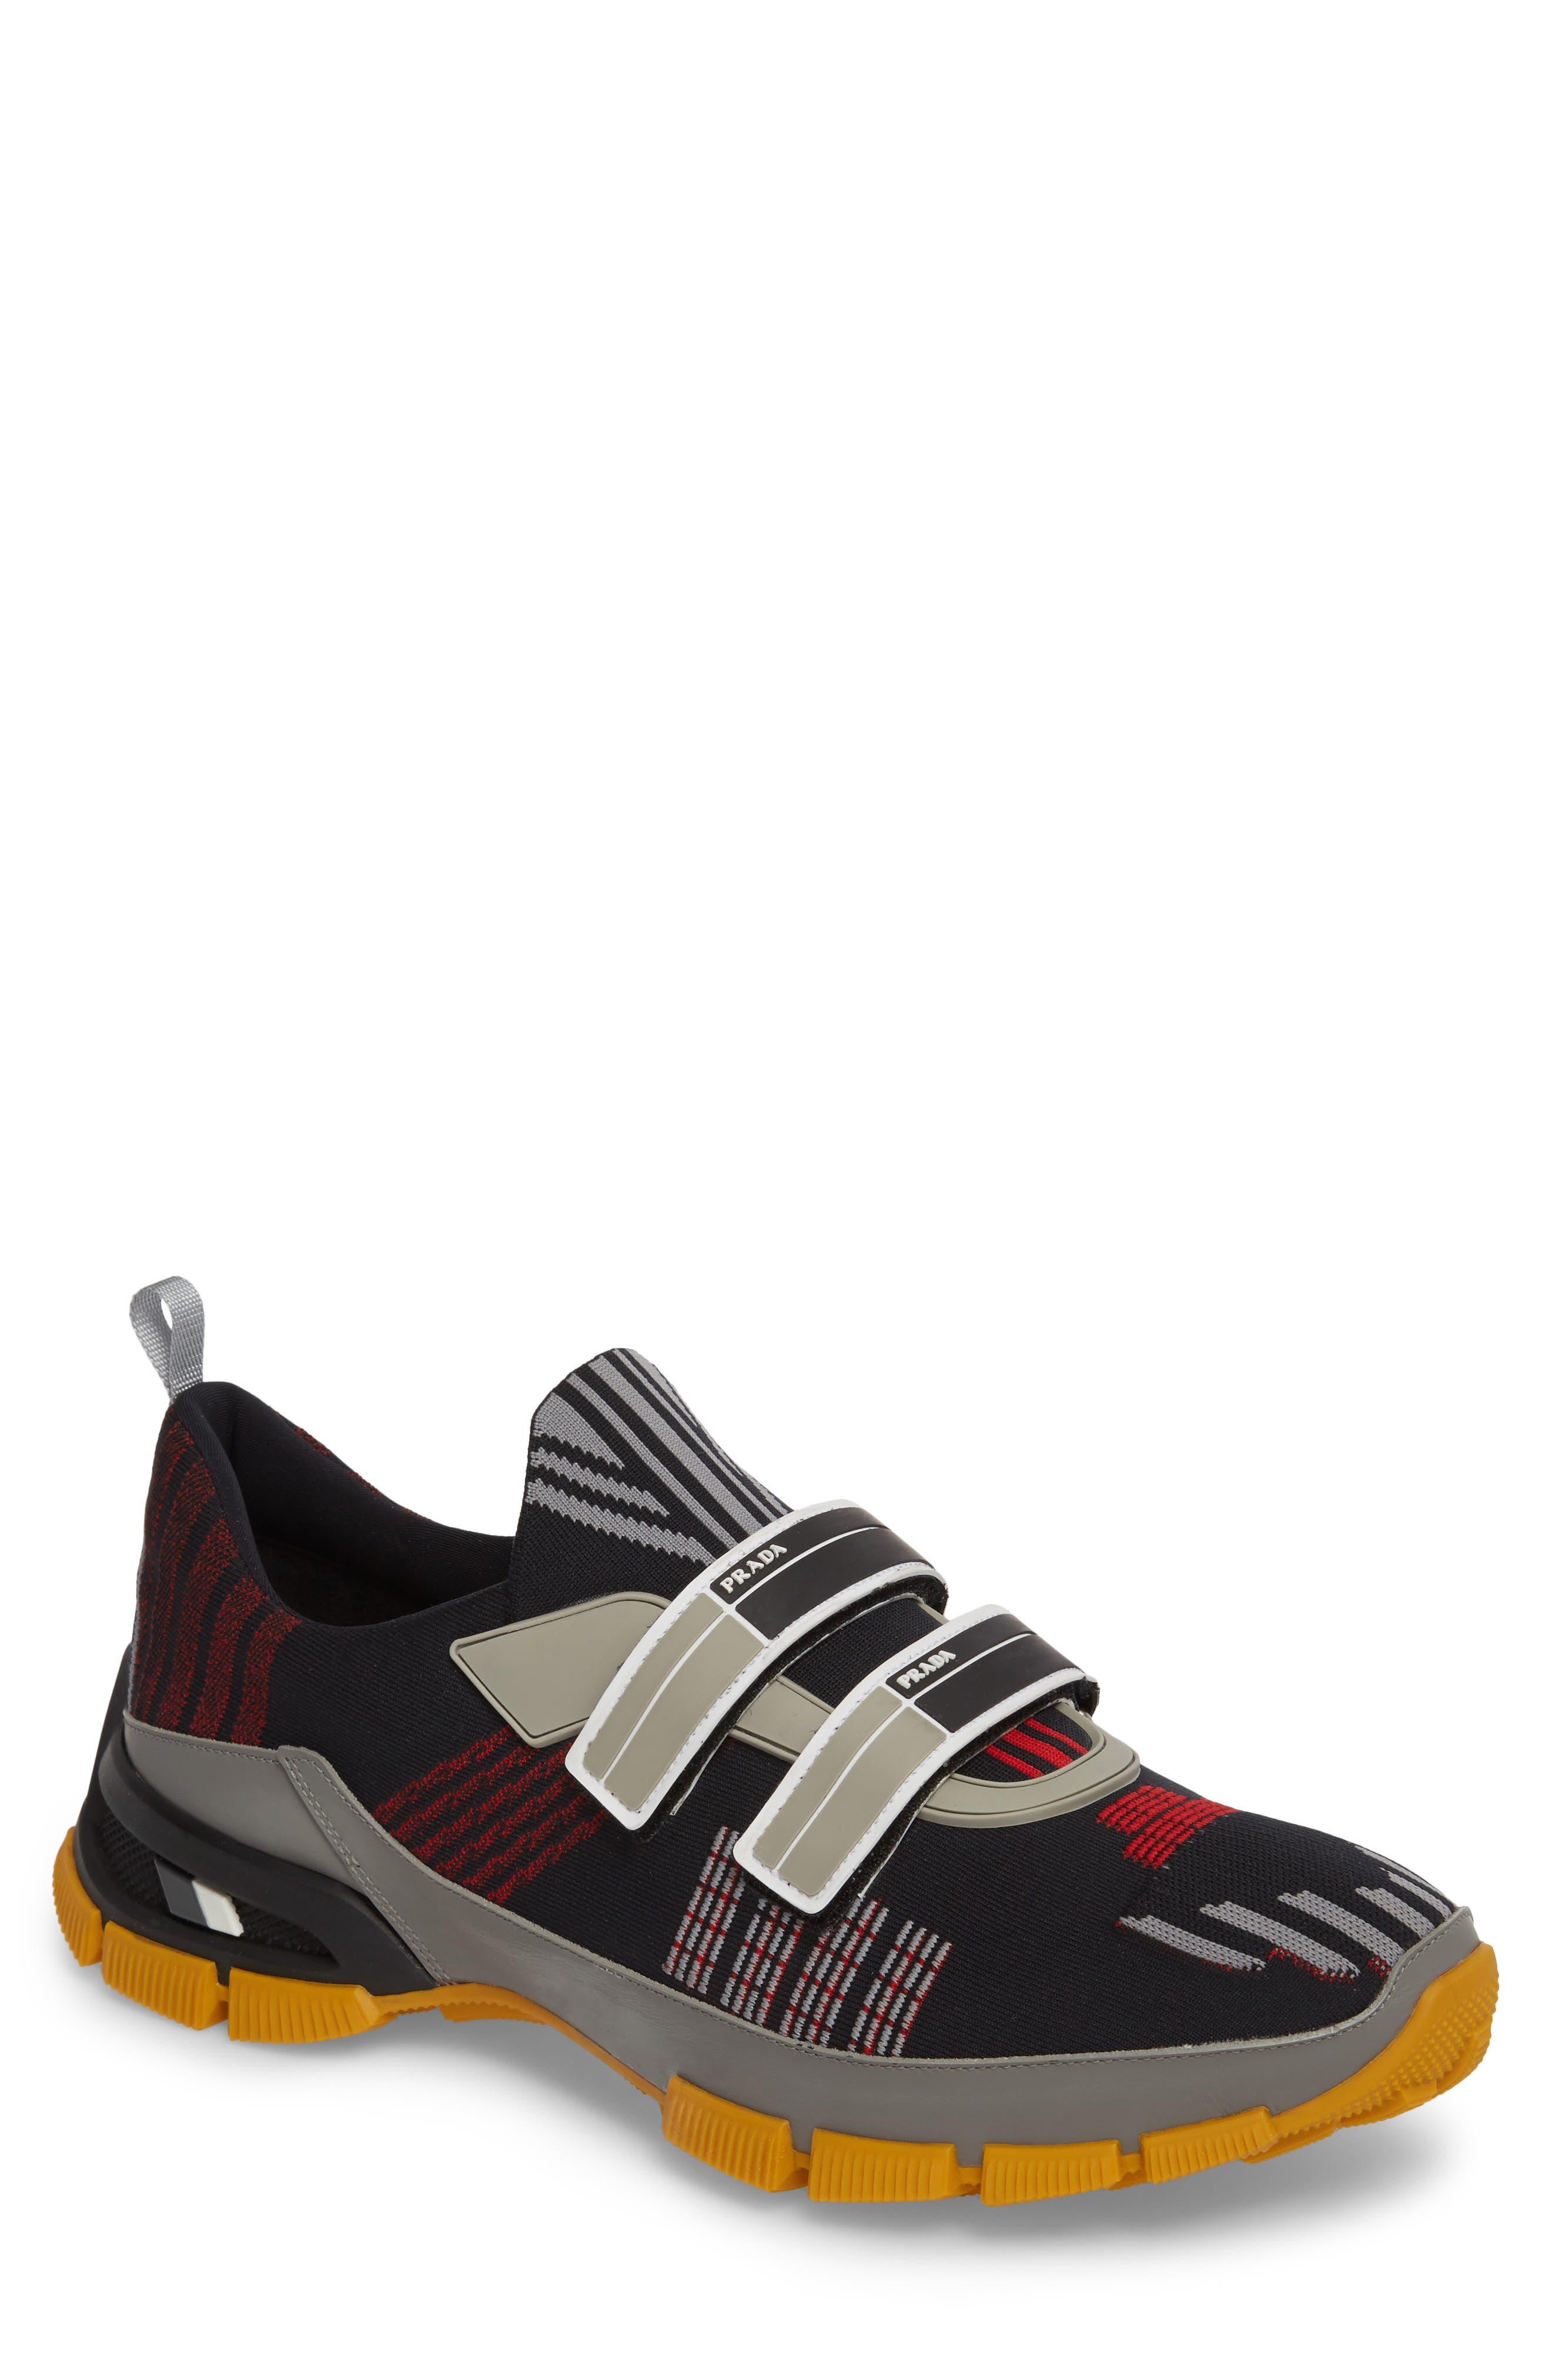 Main Image - Prada Linea Rossa Strap Sneaker (Men)